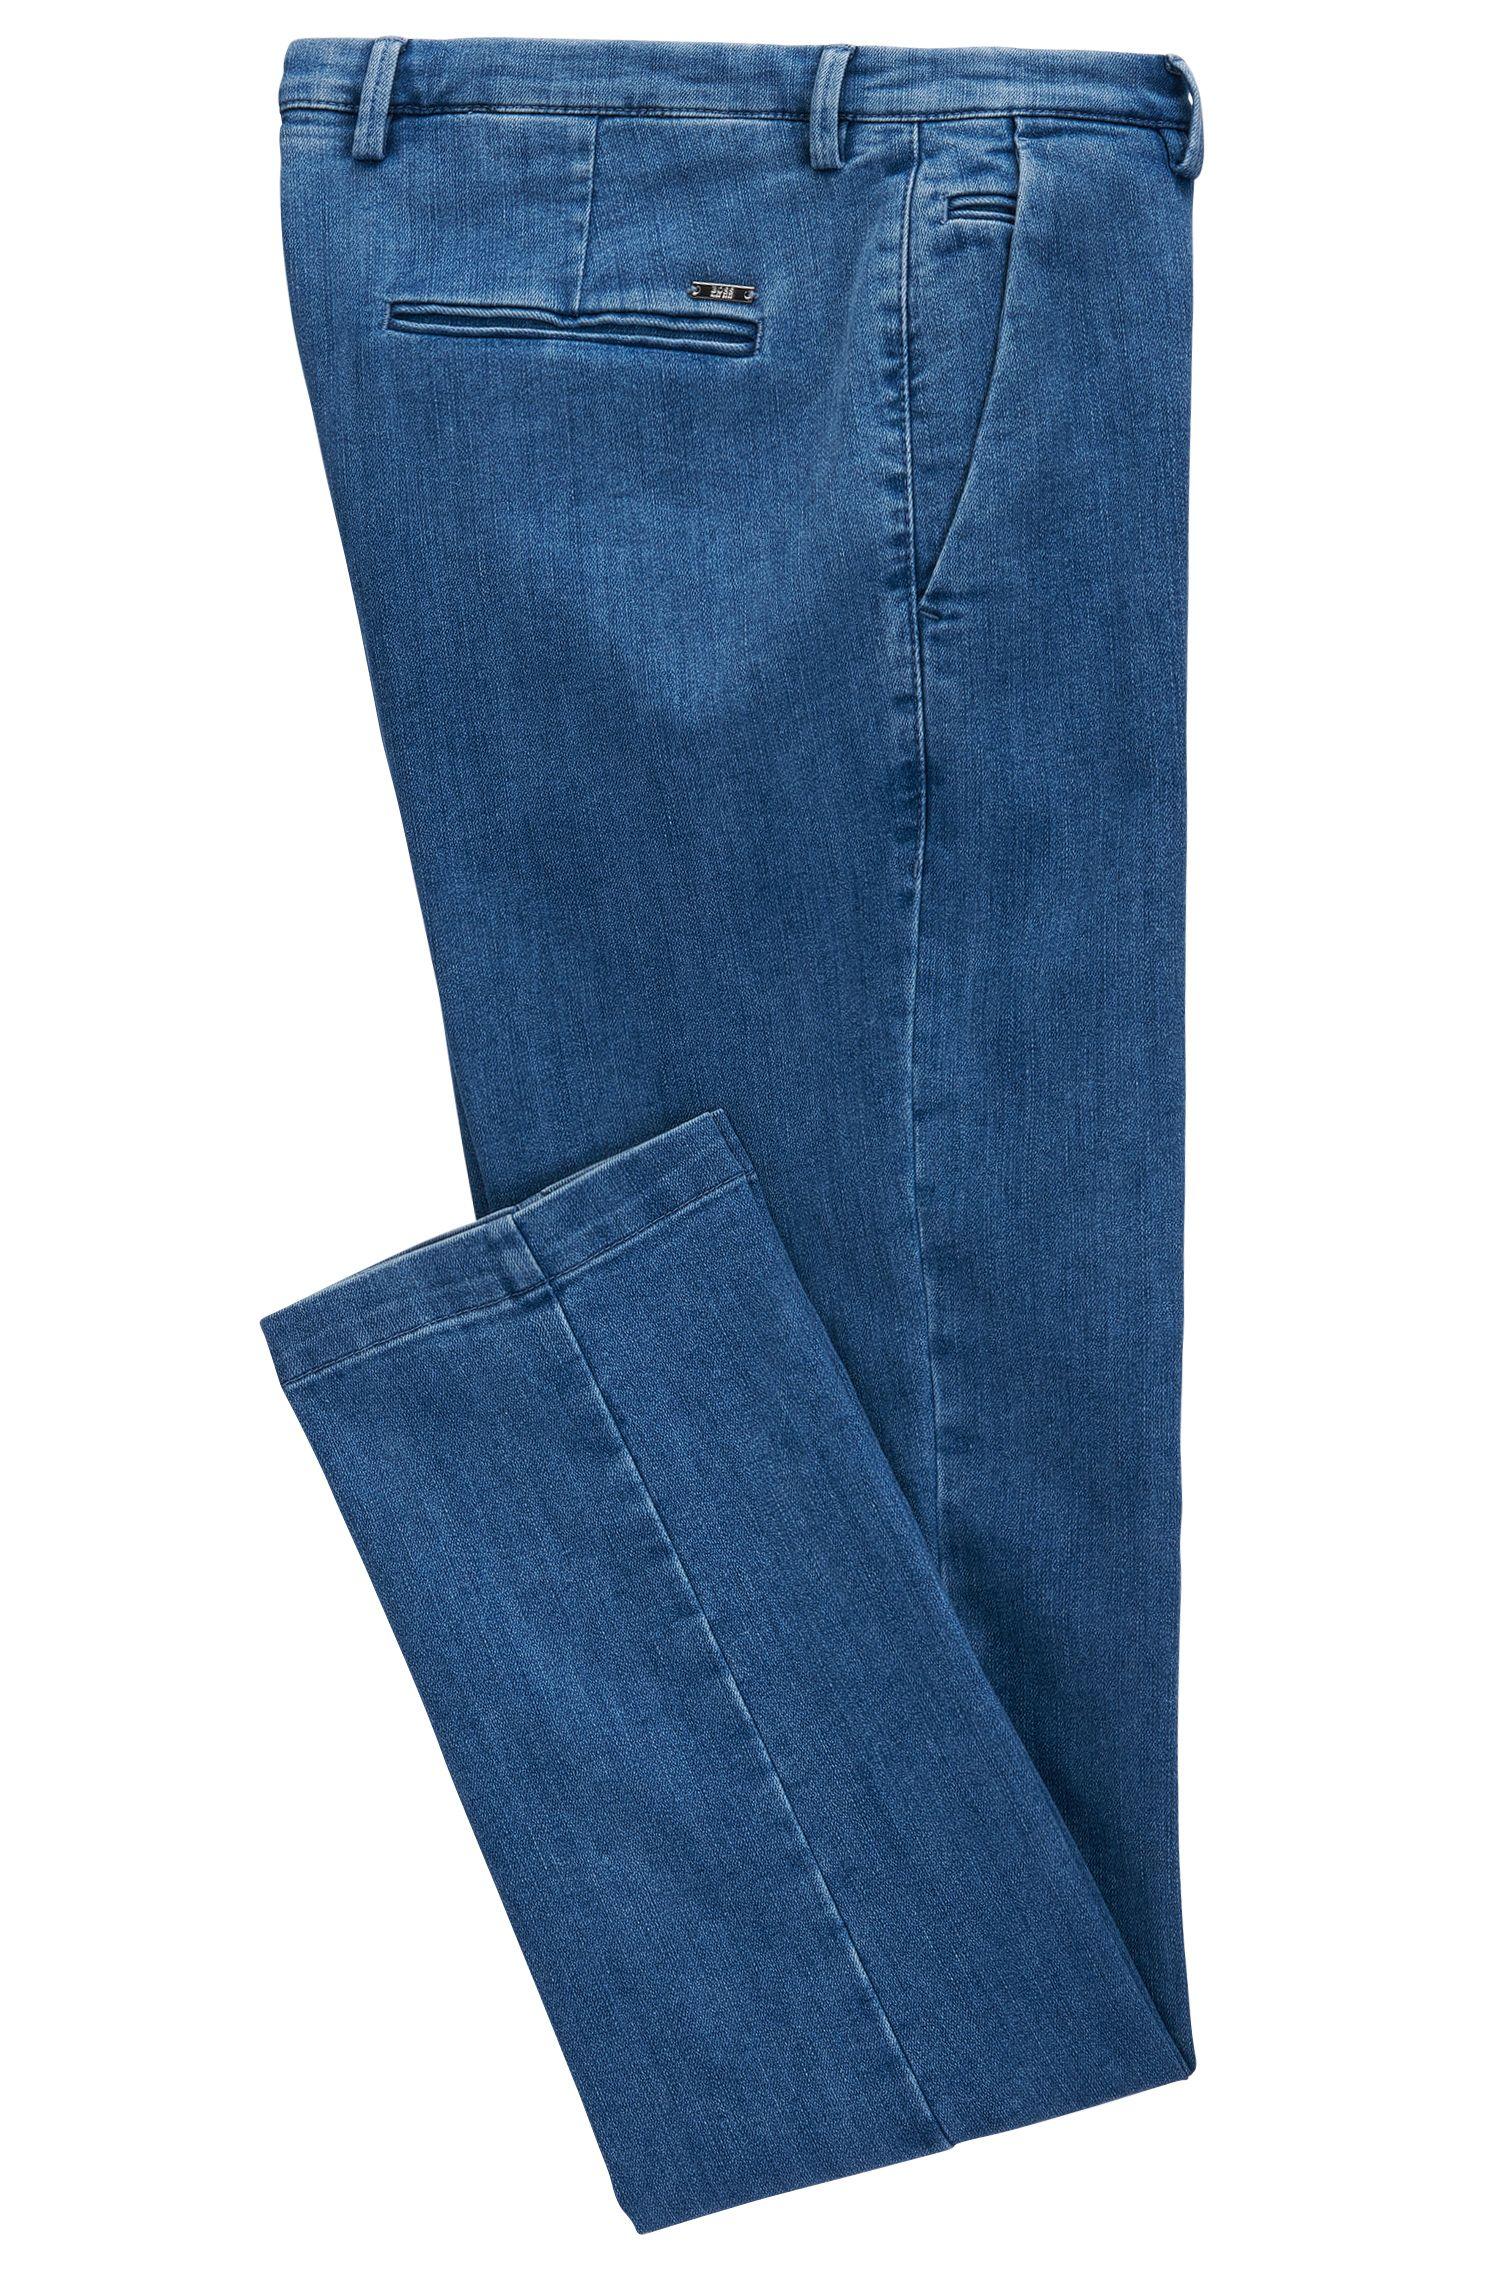 Italian Cotton Blend Denim Pant, Slim Fit | Rice W, Light Blue